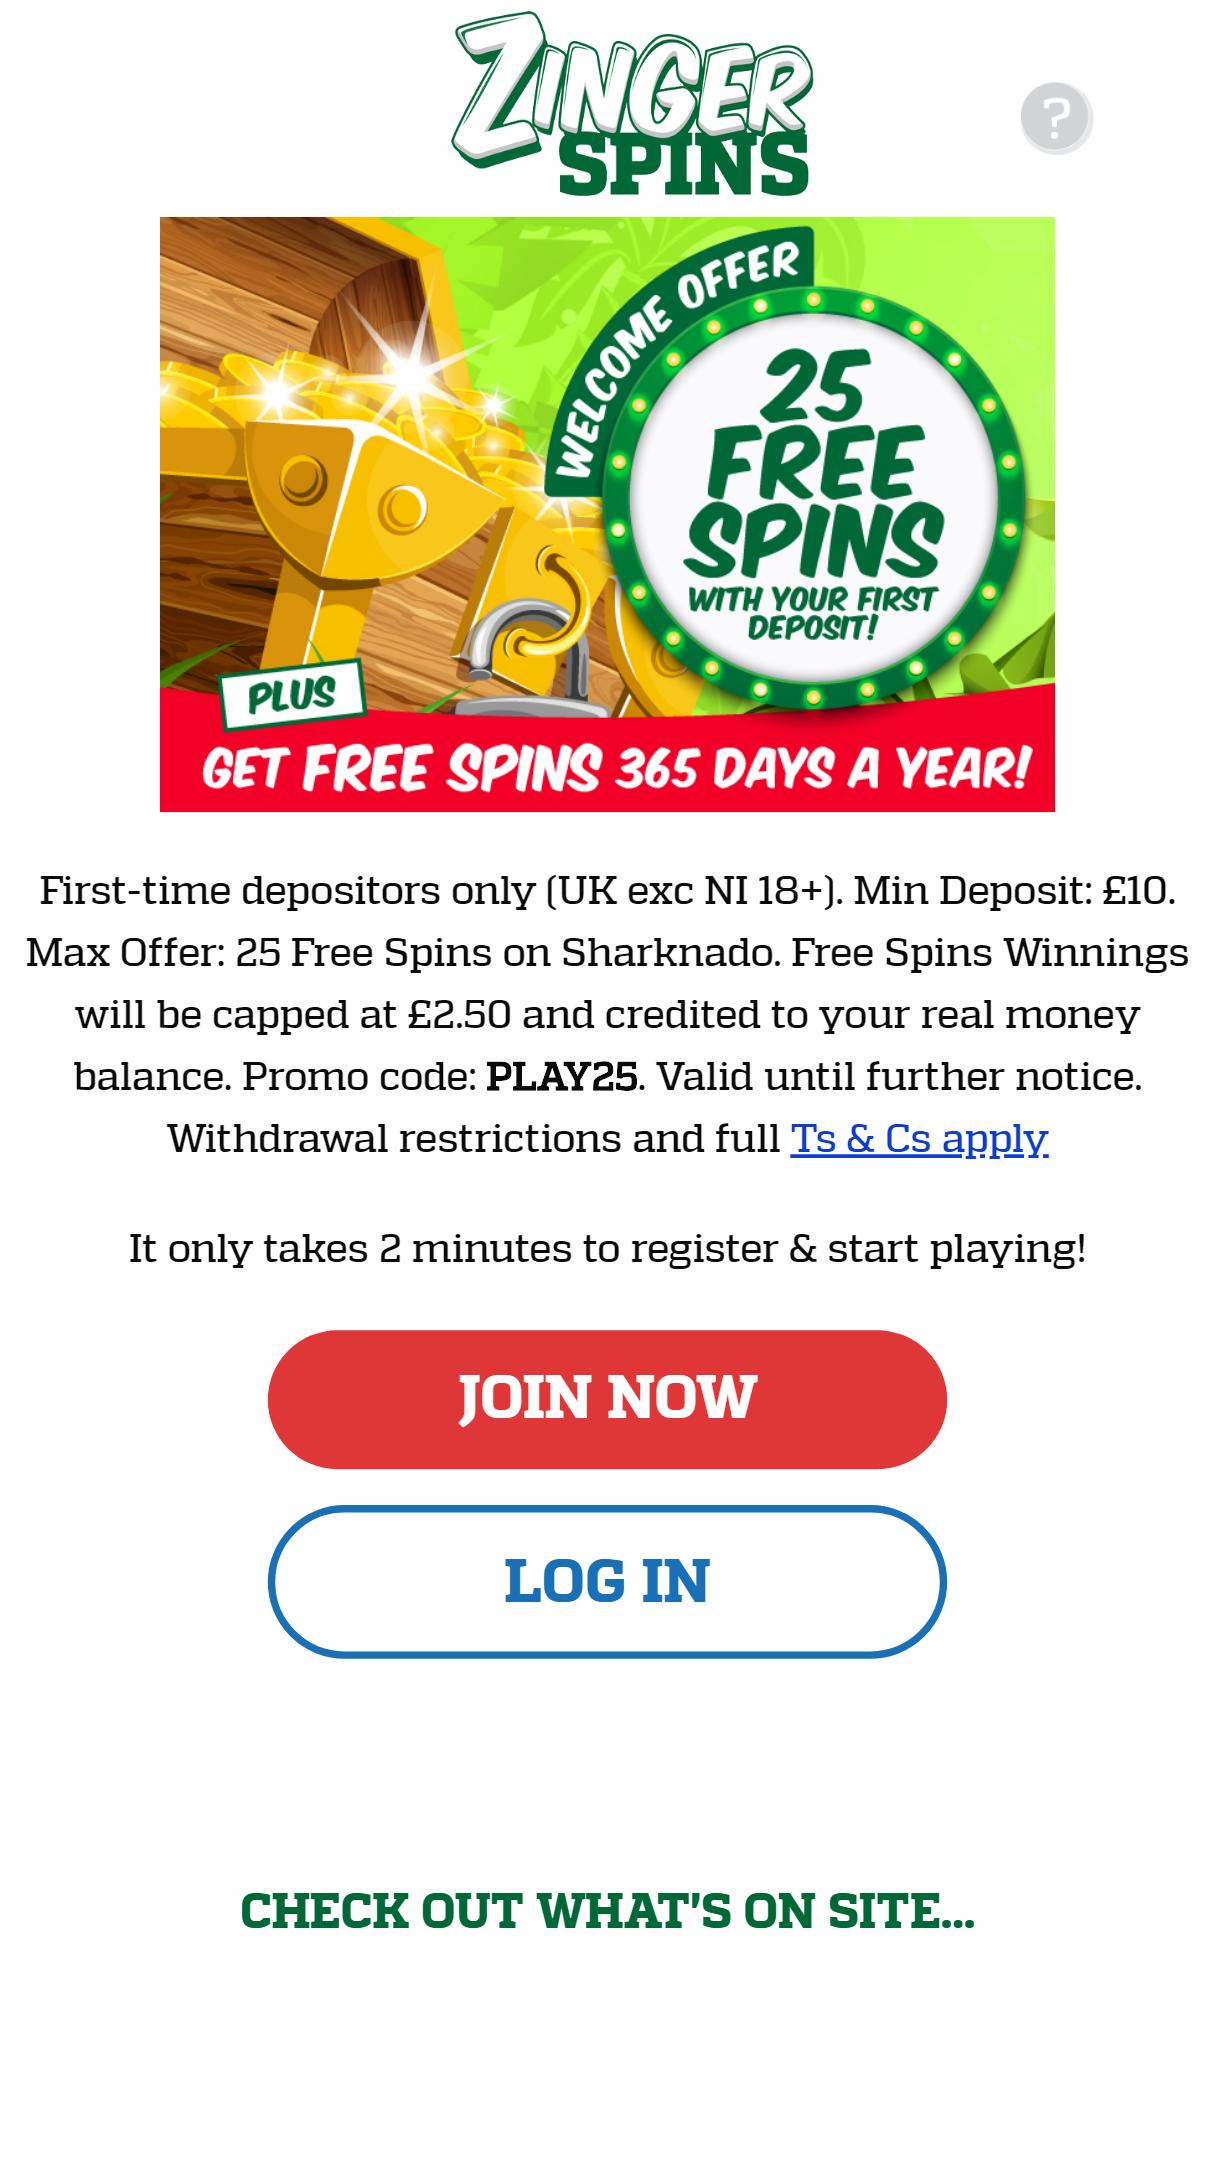 Zinger Spins App Homepage